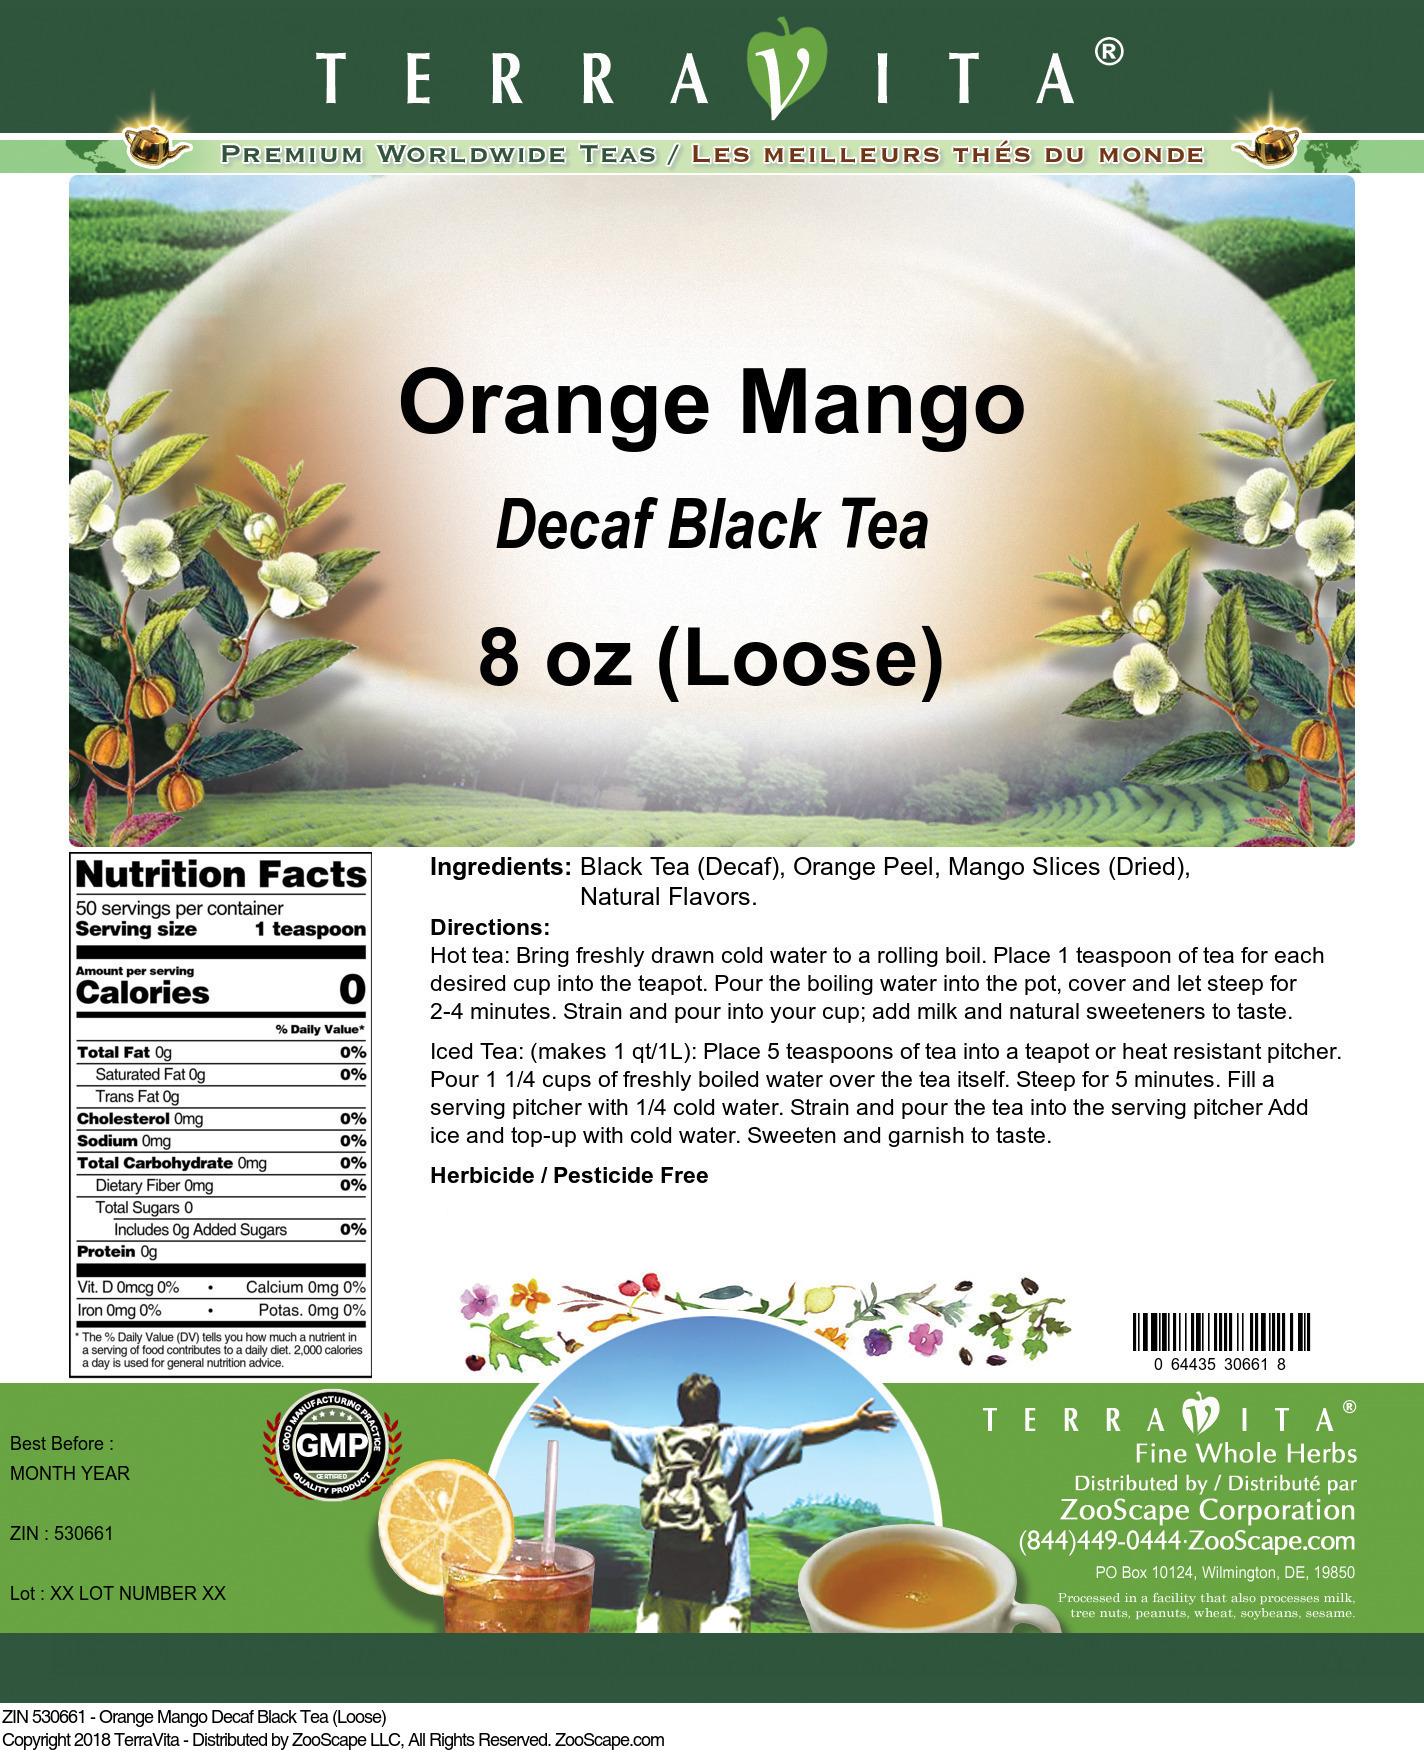 Orange Mango Decaf Black Tea